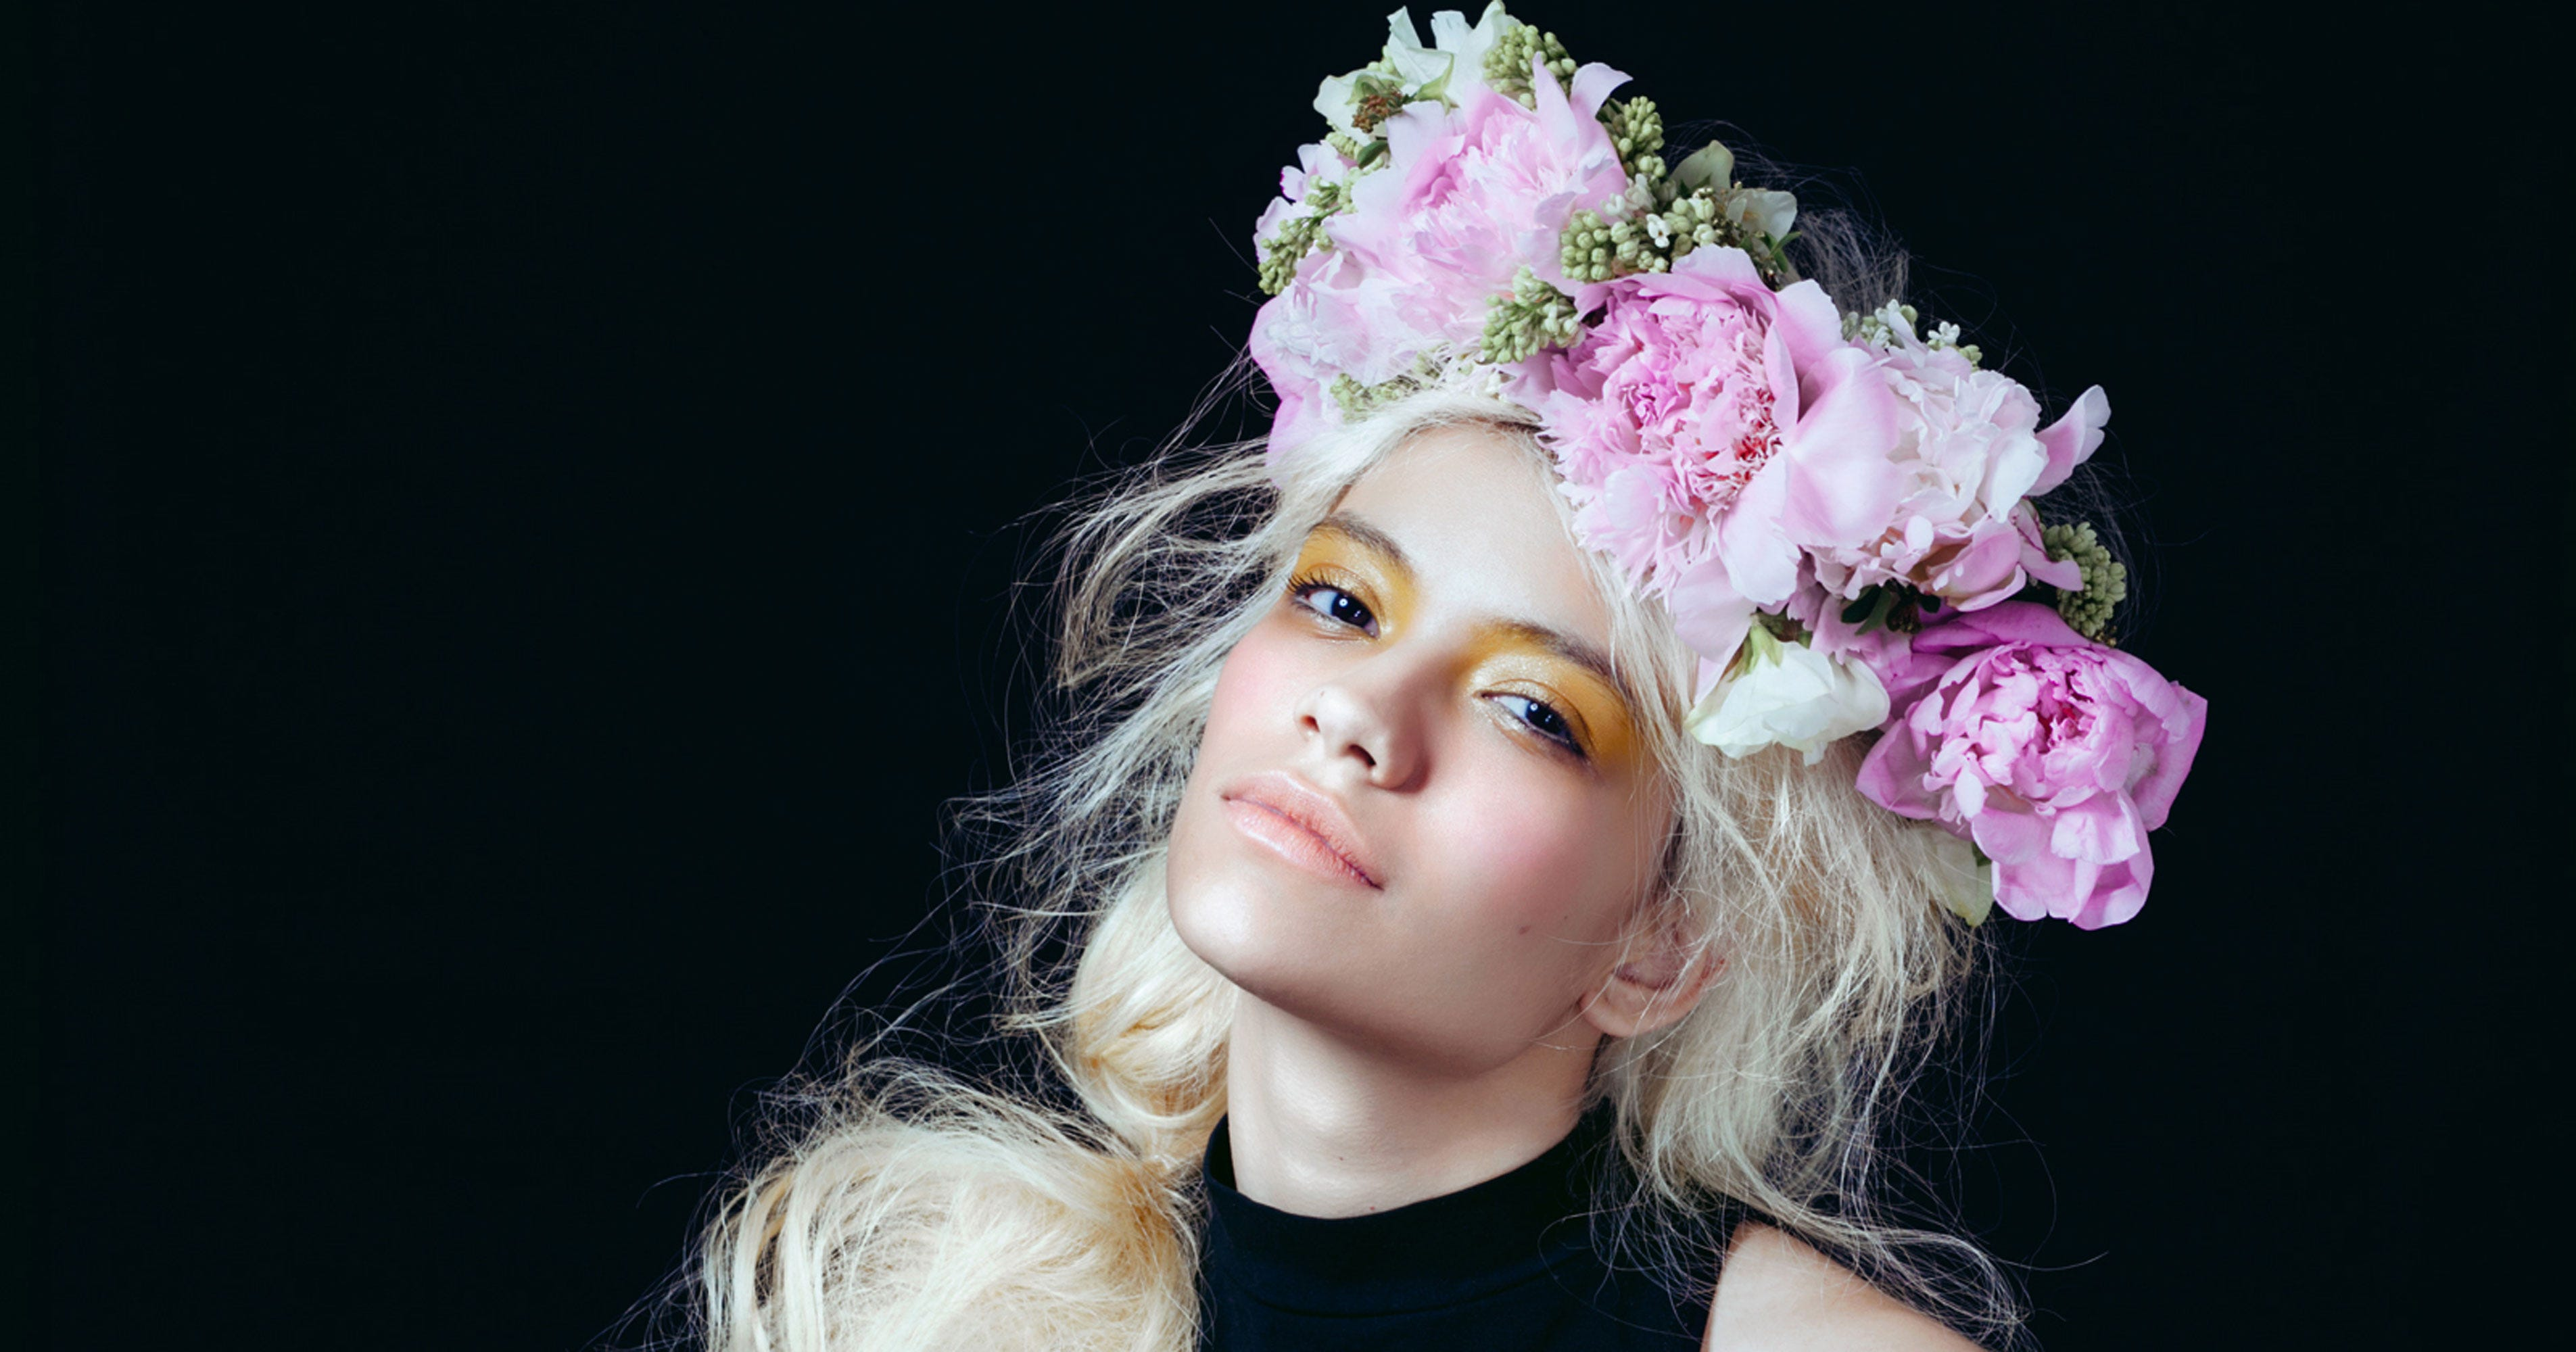 Vinok Ukrainian Instagram Flower Crowns